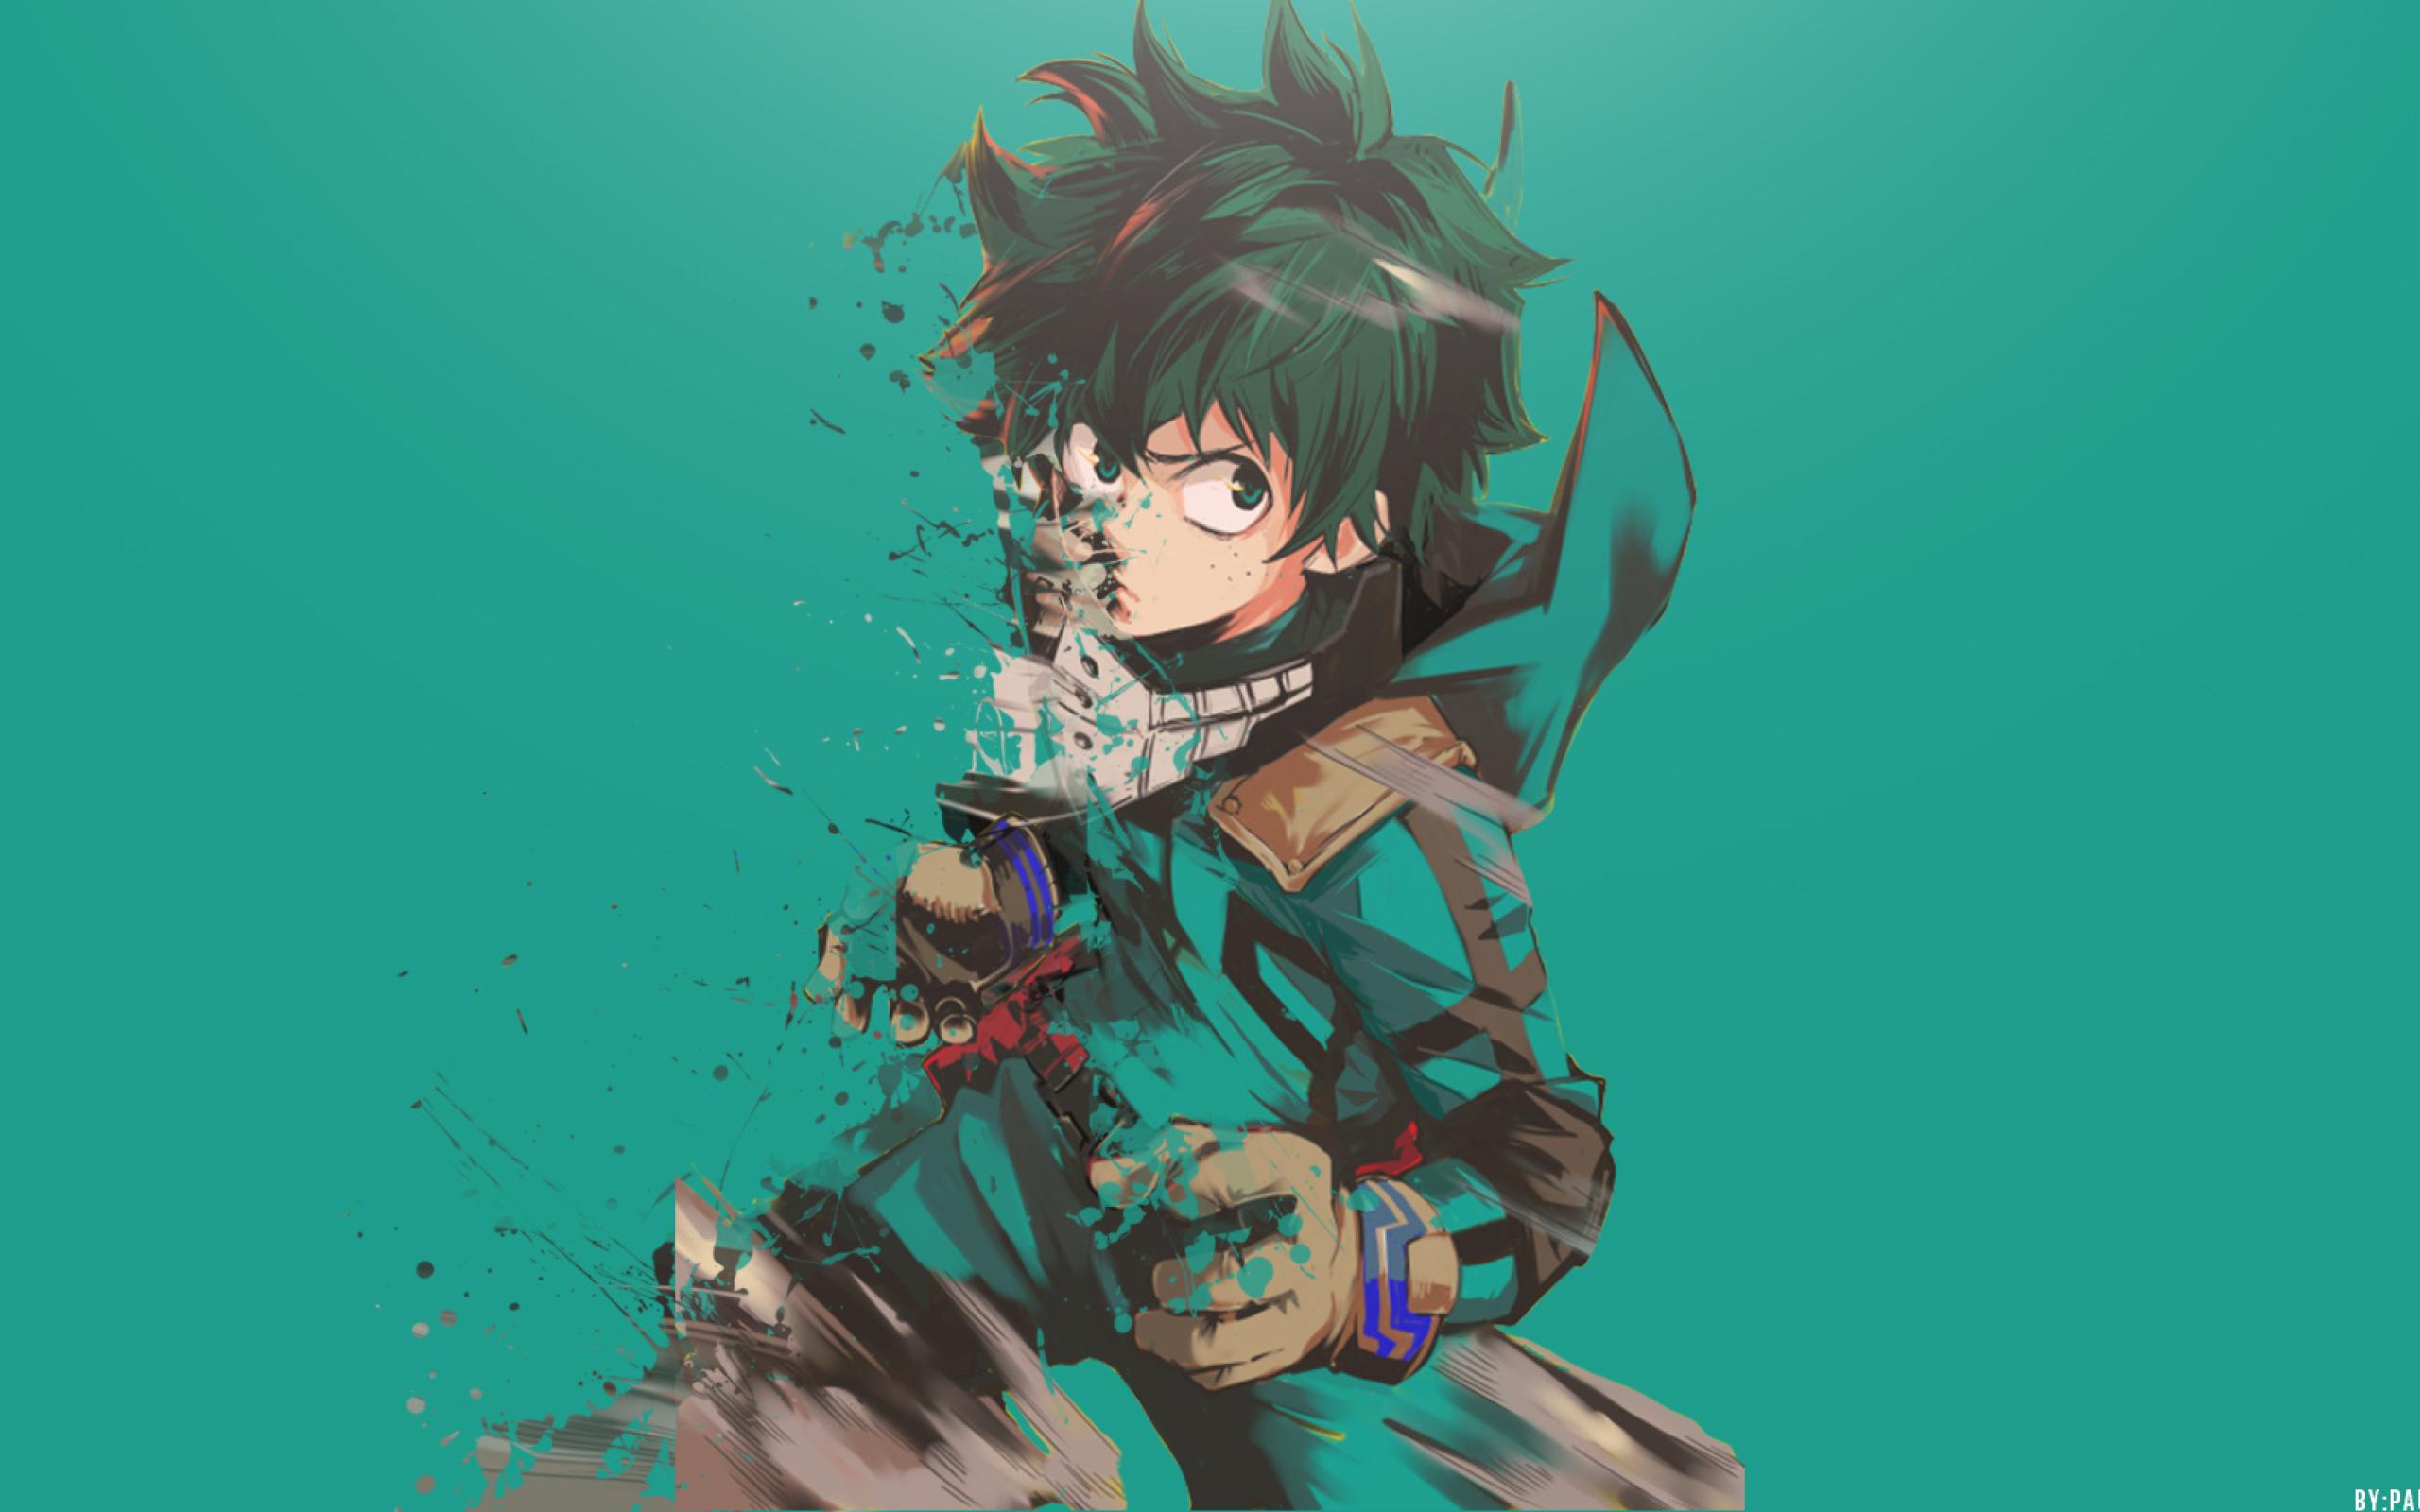 Boku No Hero Academia Midoriya Izuku Art, Full HD Wallpaper